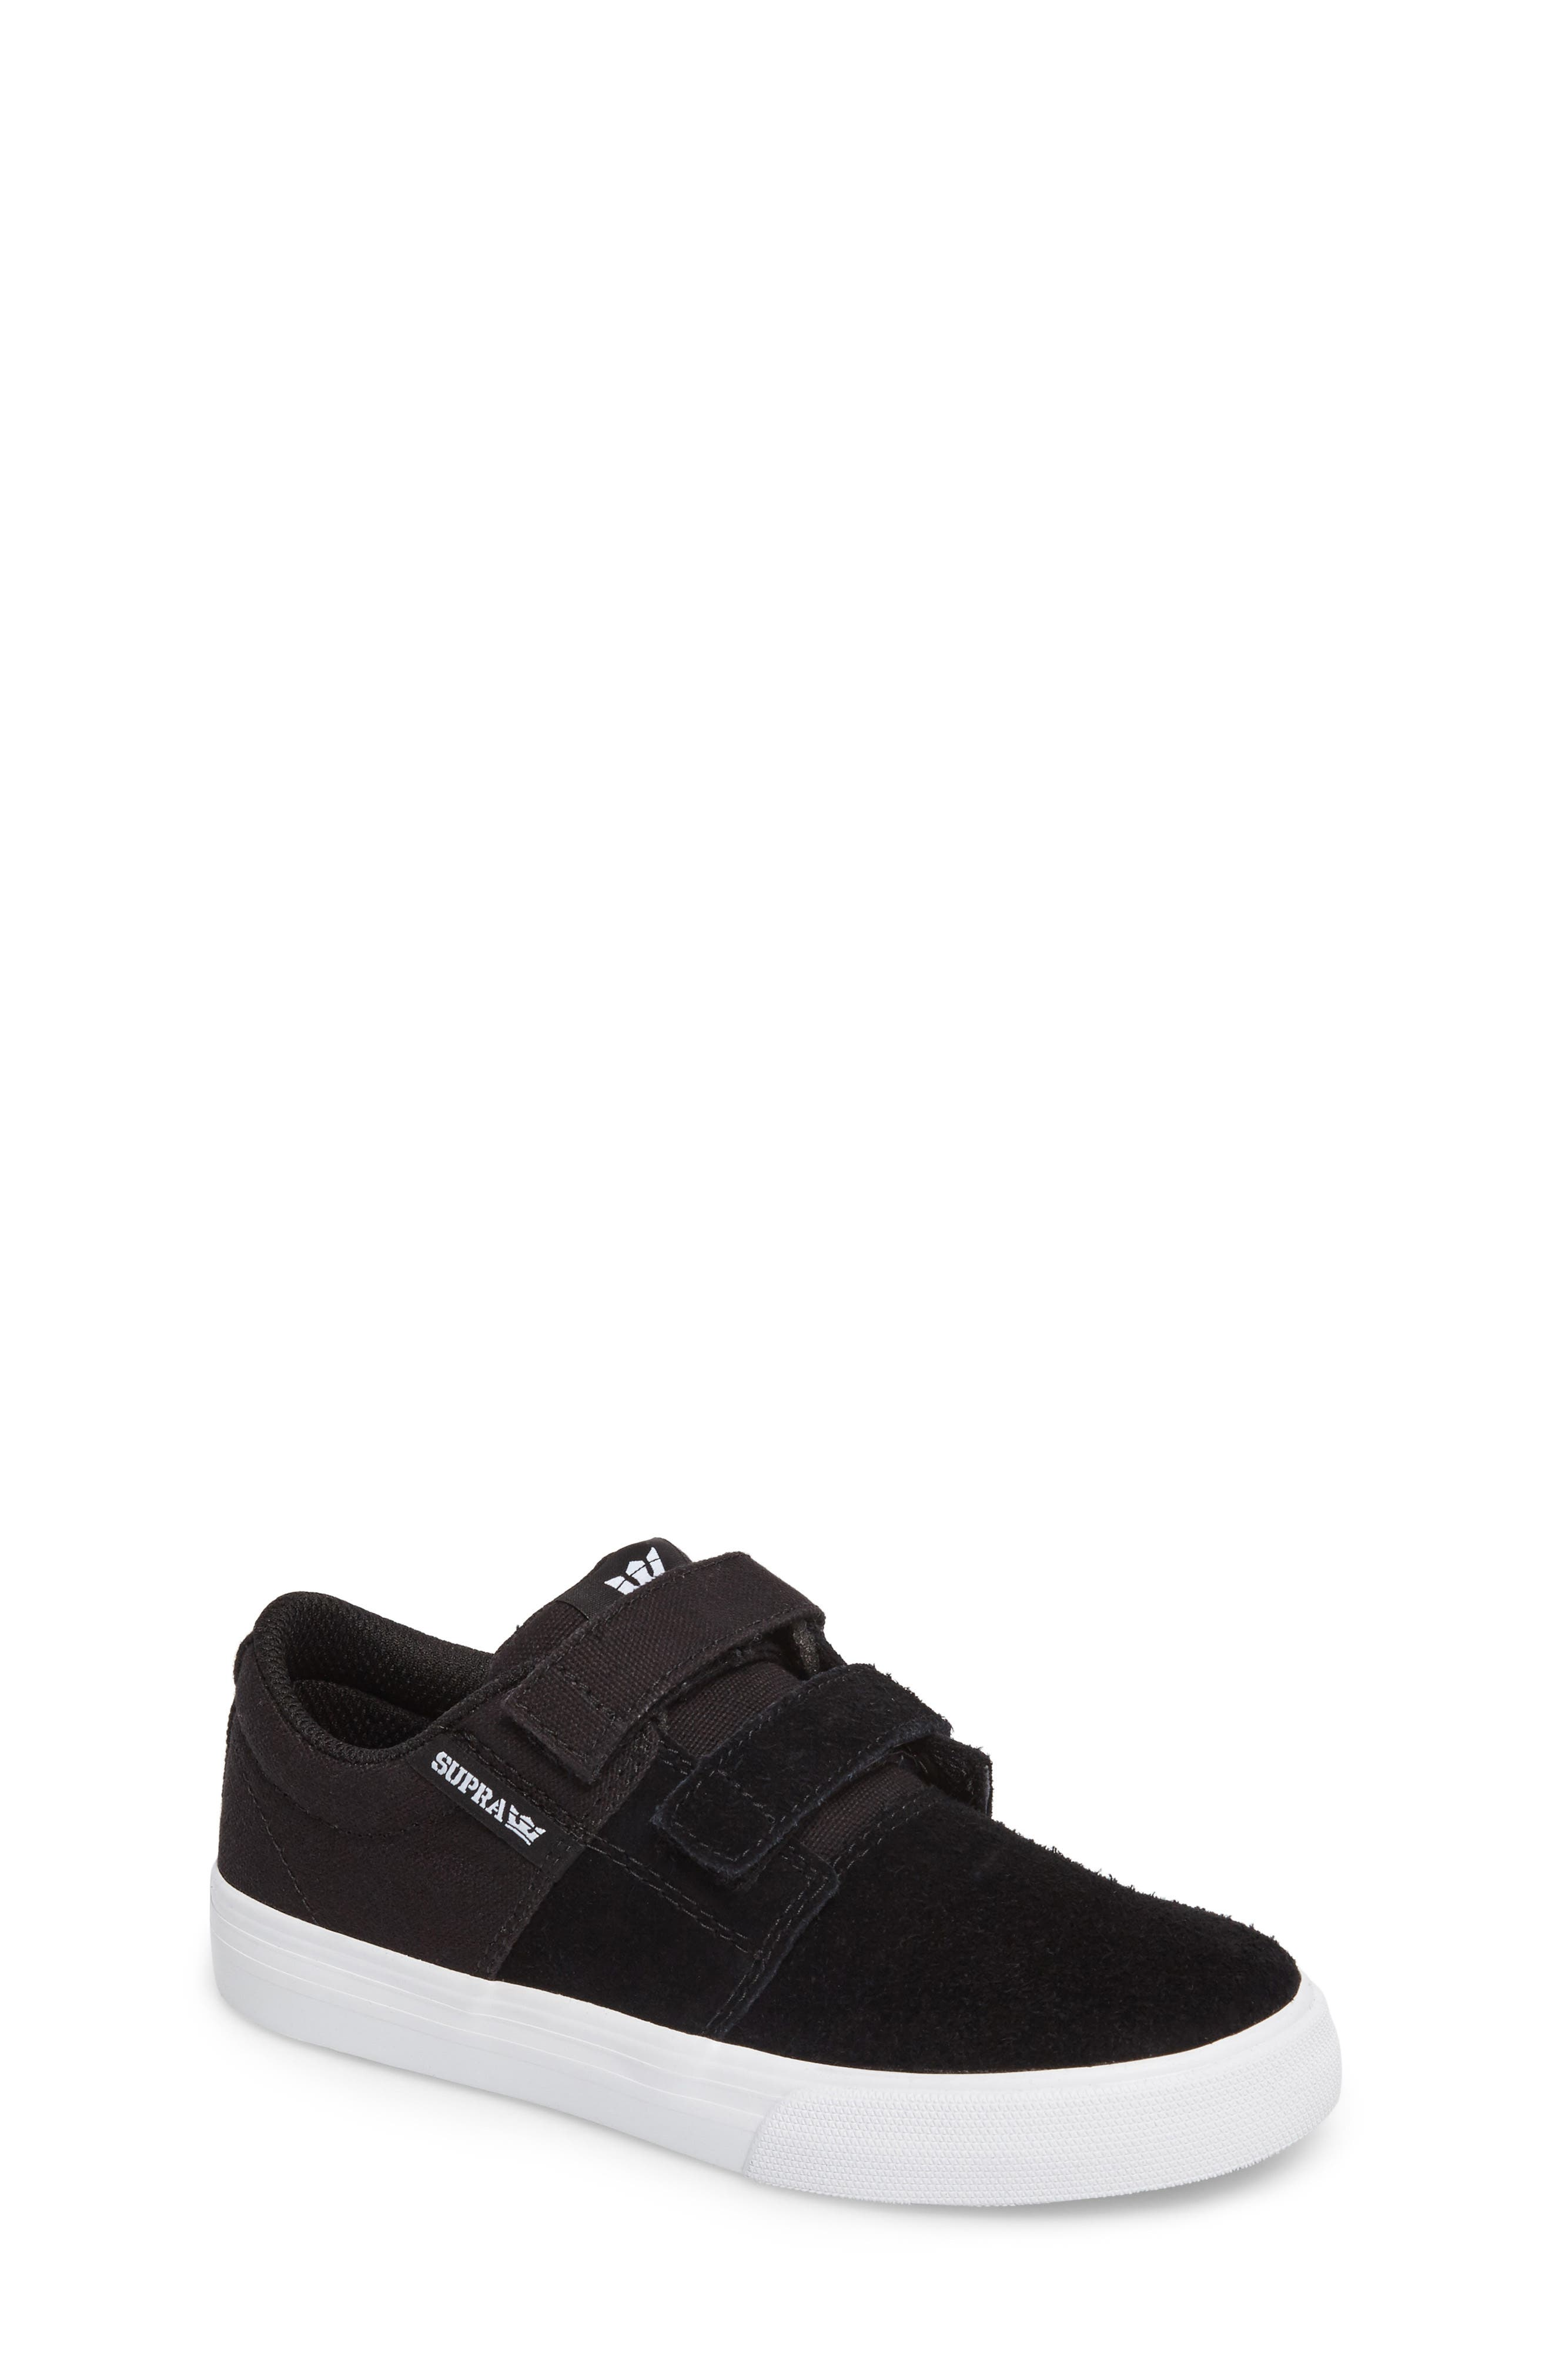 Supra Stacks Low Top Sneaker (Toddler, Little Kid & Big Kid)